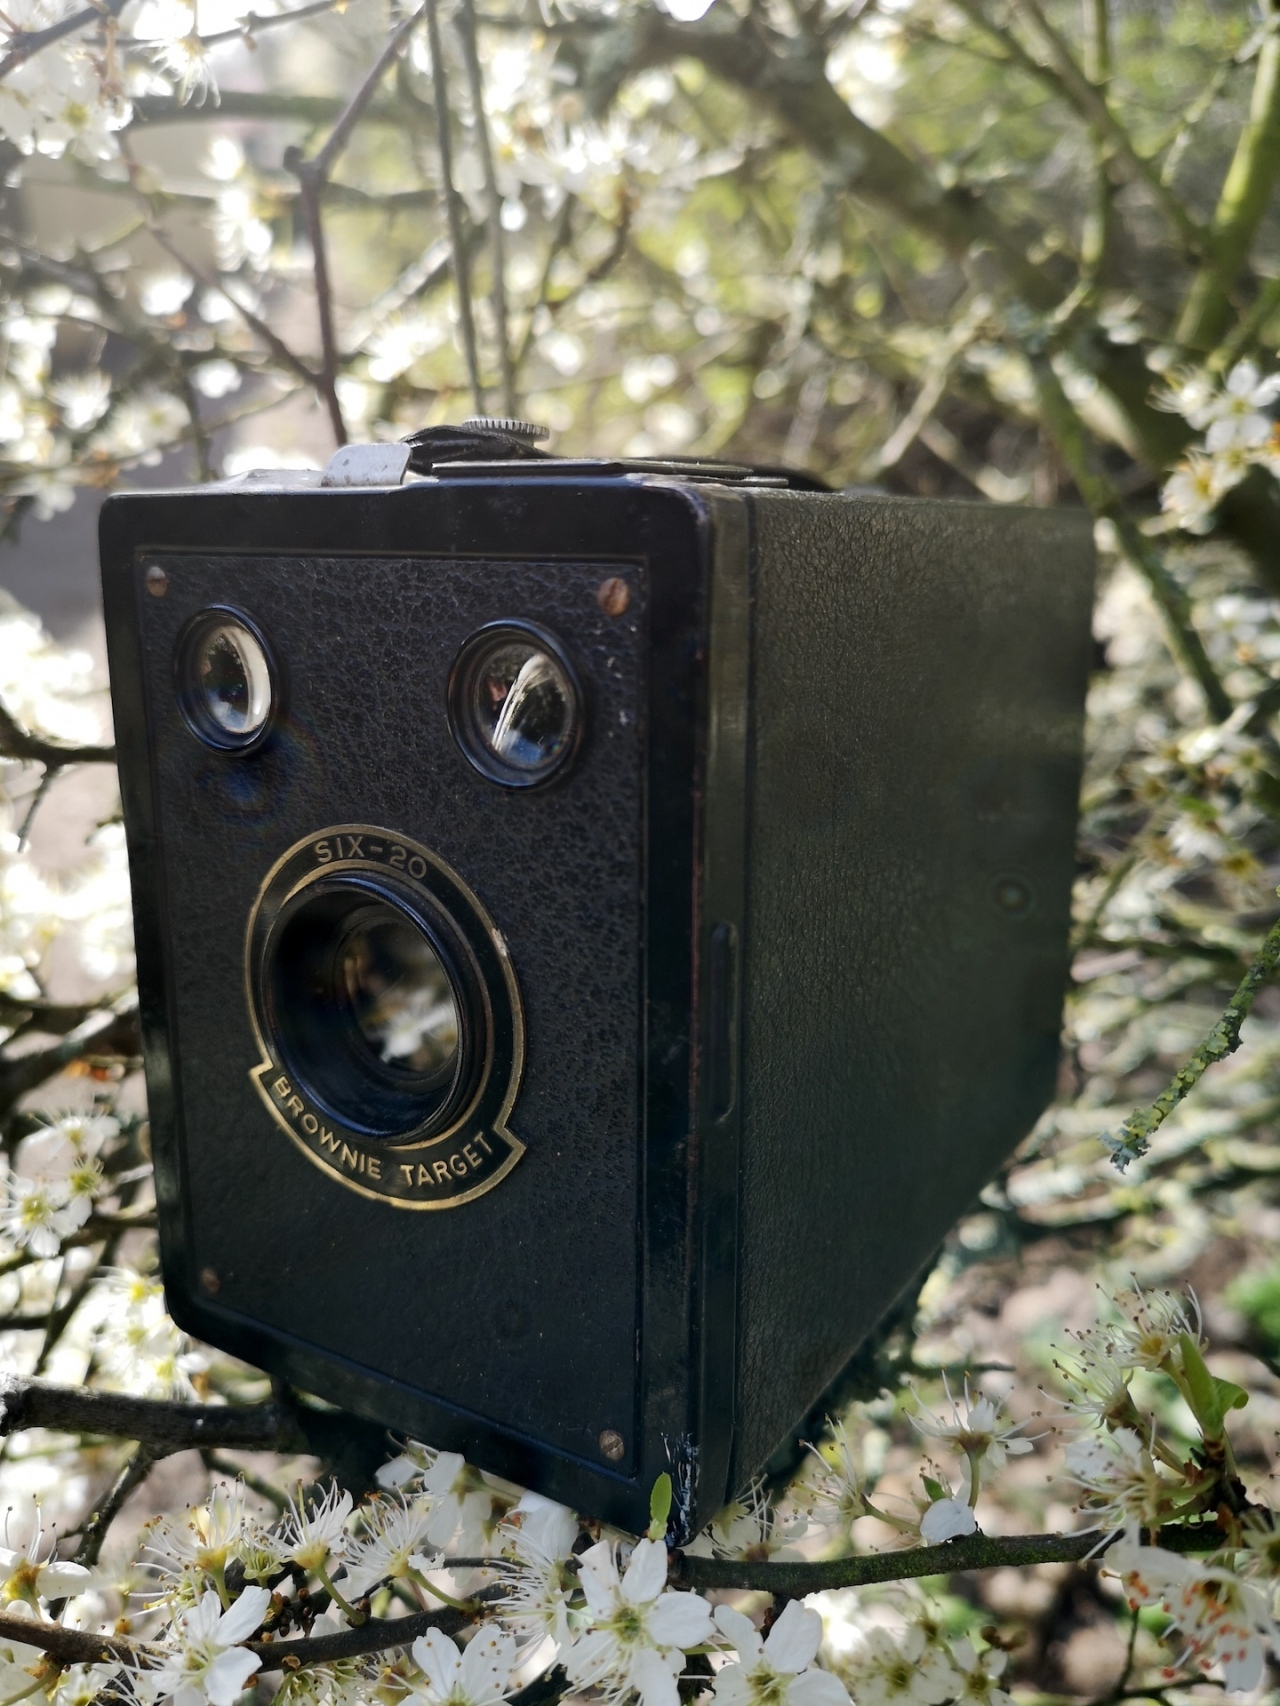 Kodak Six-20 BrownieTarget